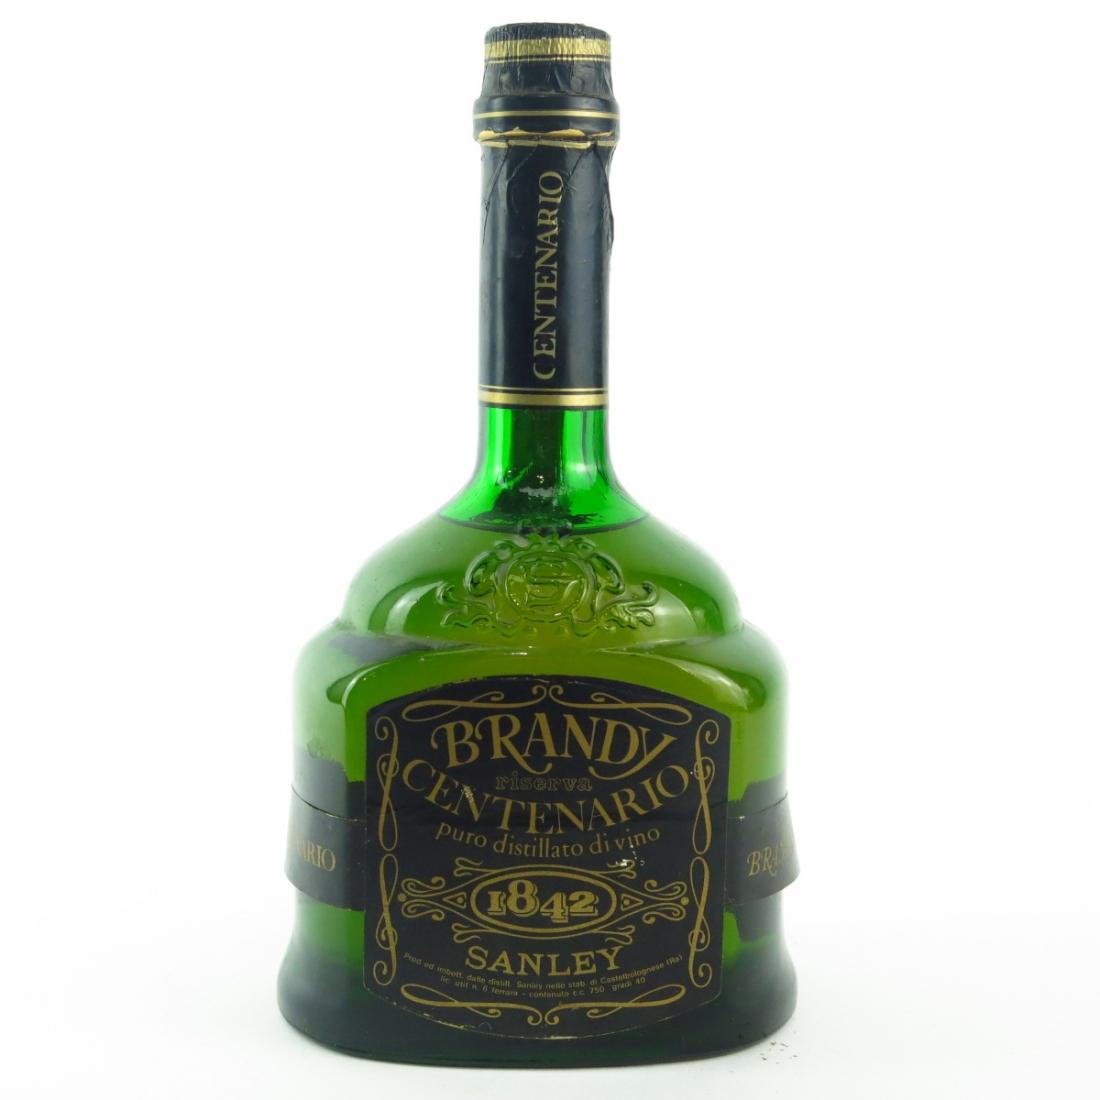 Sanley Centenario Brandy 1970s